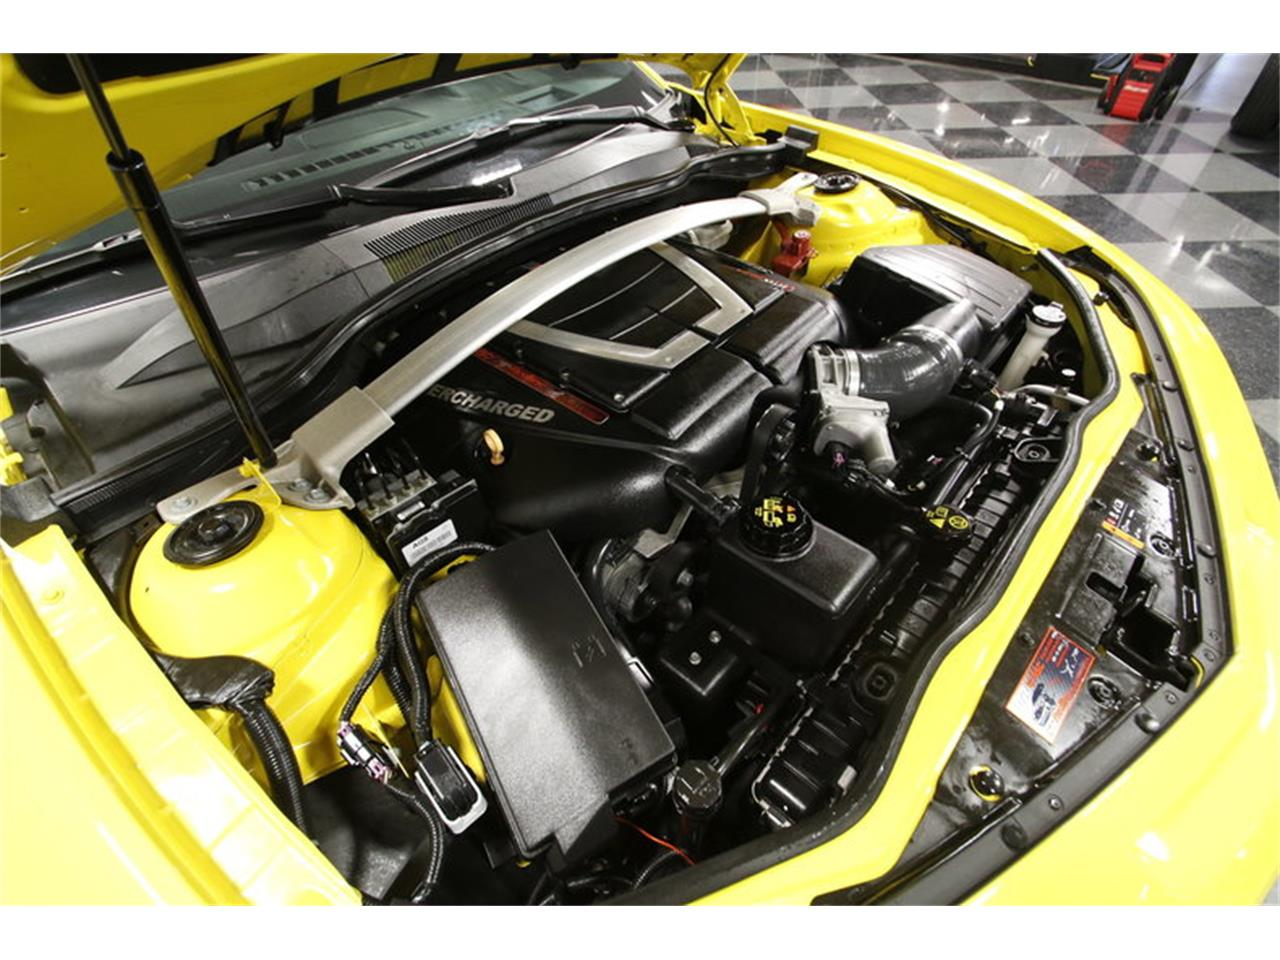 Large Picture of '11 Camaro located in North Carolina - MZEP